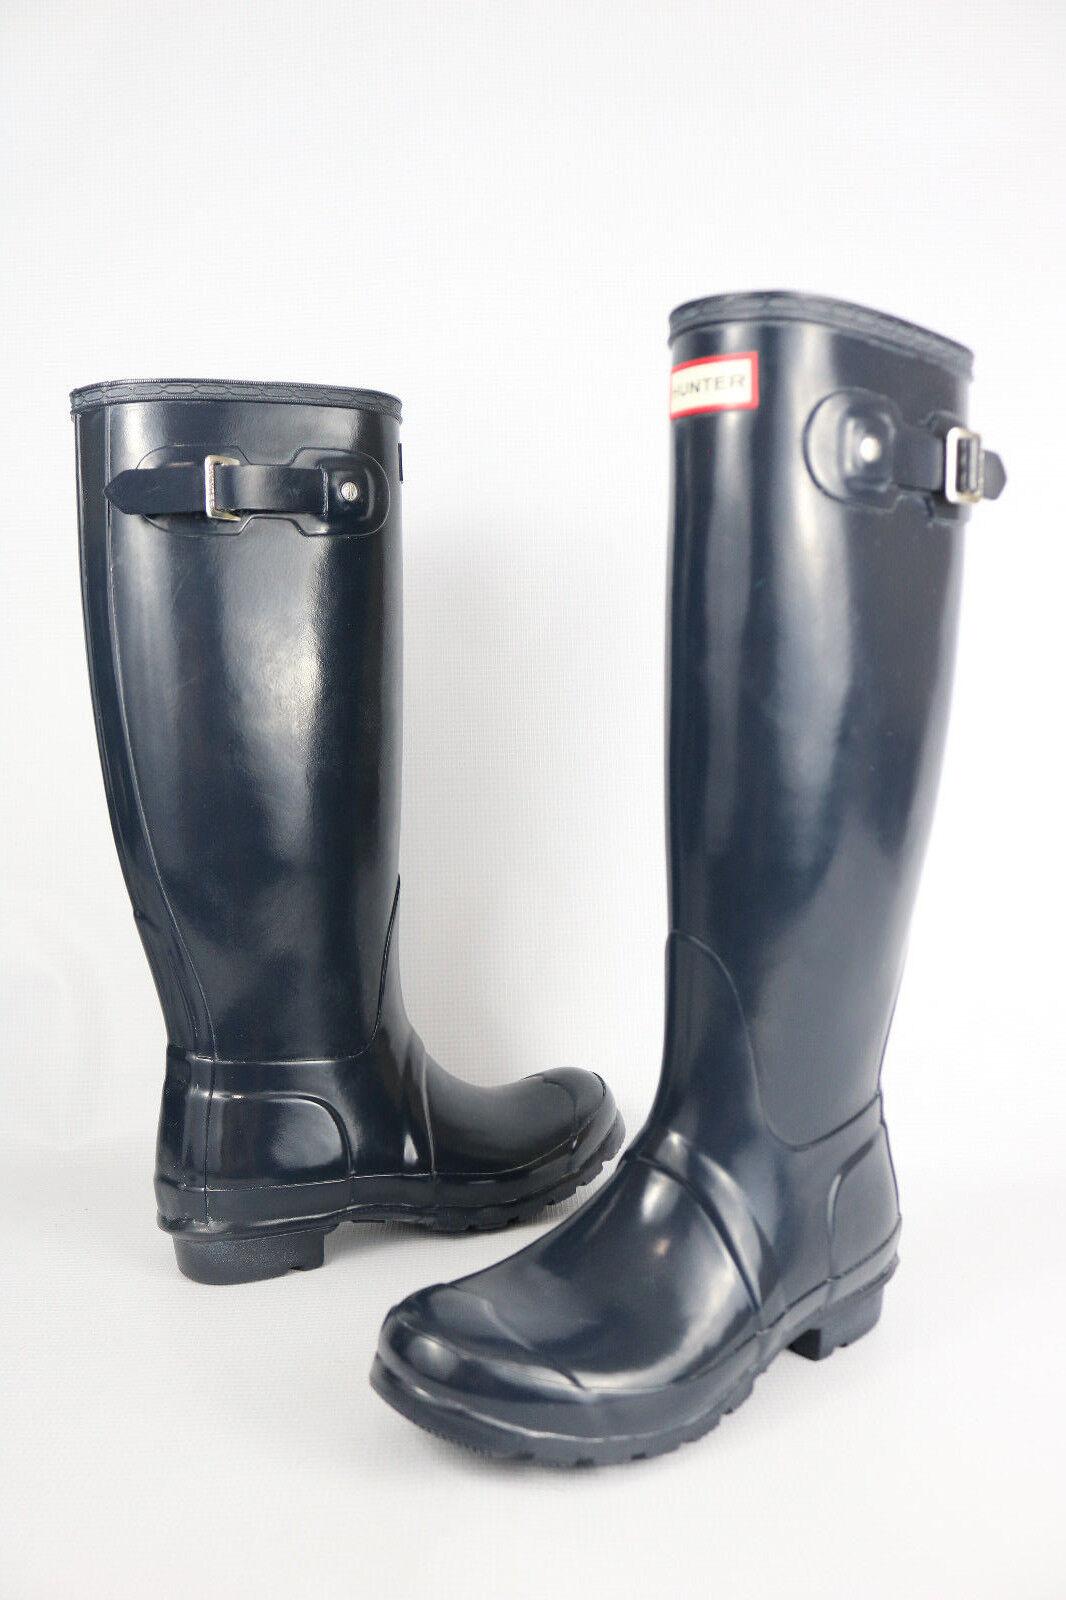 supporto al dettaglio all'ingrosso Hunter Original Tall Gloss Gloss Gloss Rain stivali 6 US Navy blu WFT1000RGL Wellies donna  negozio online